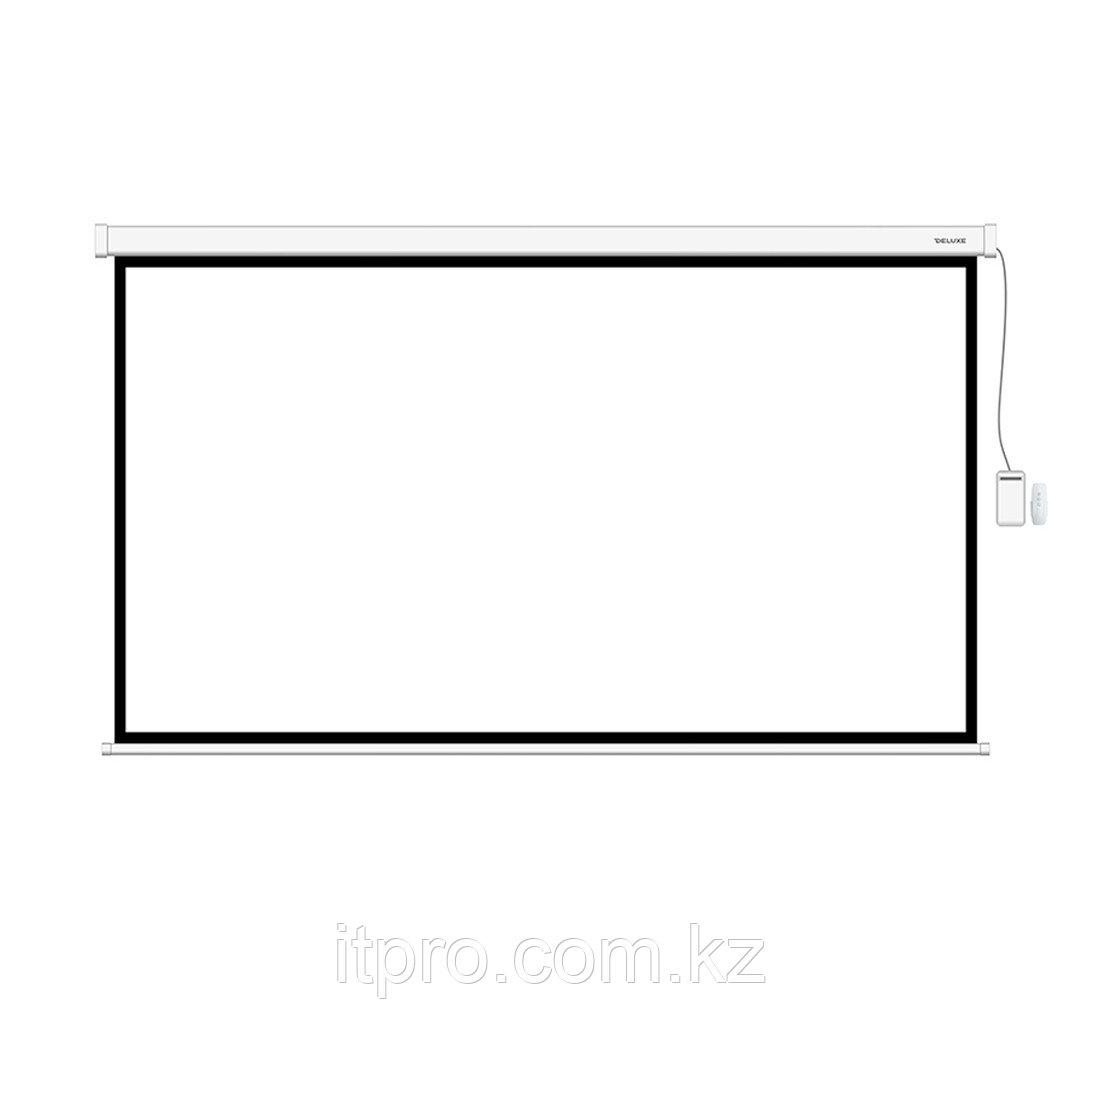 Экран моторизированный Deluxe DLS-ERC300x180W